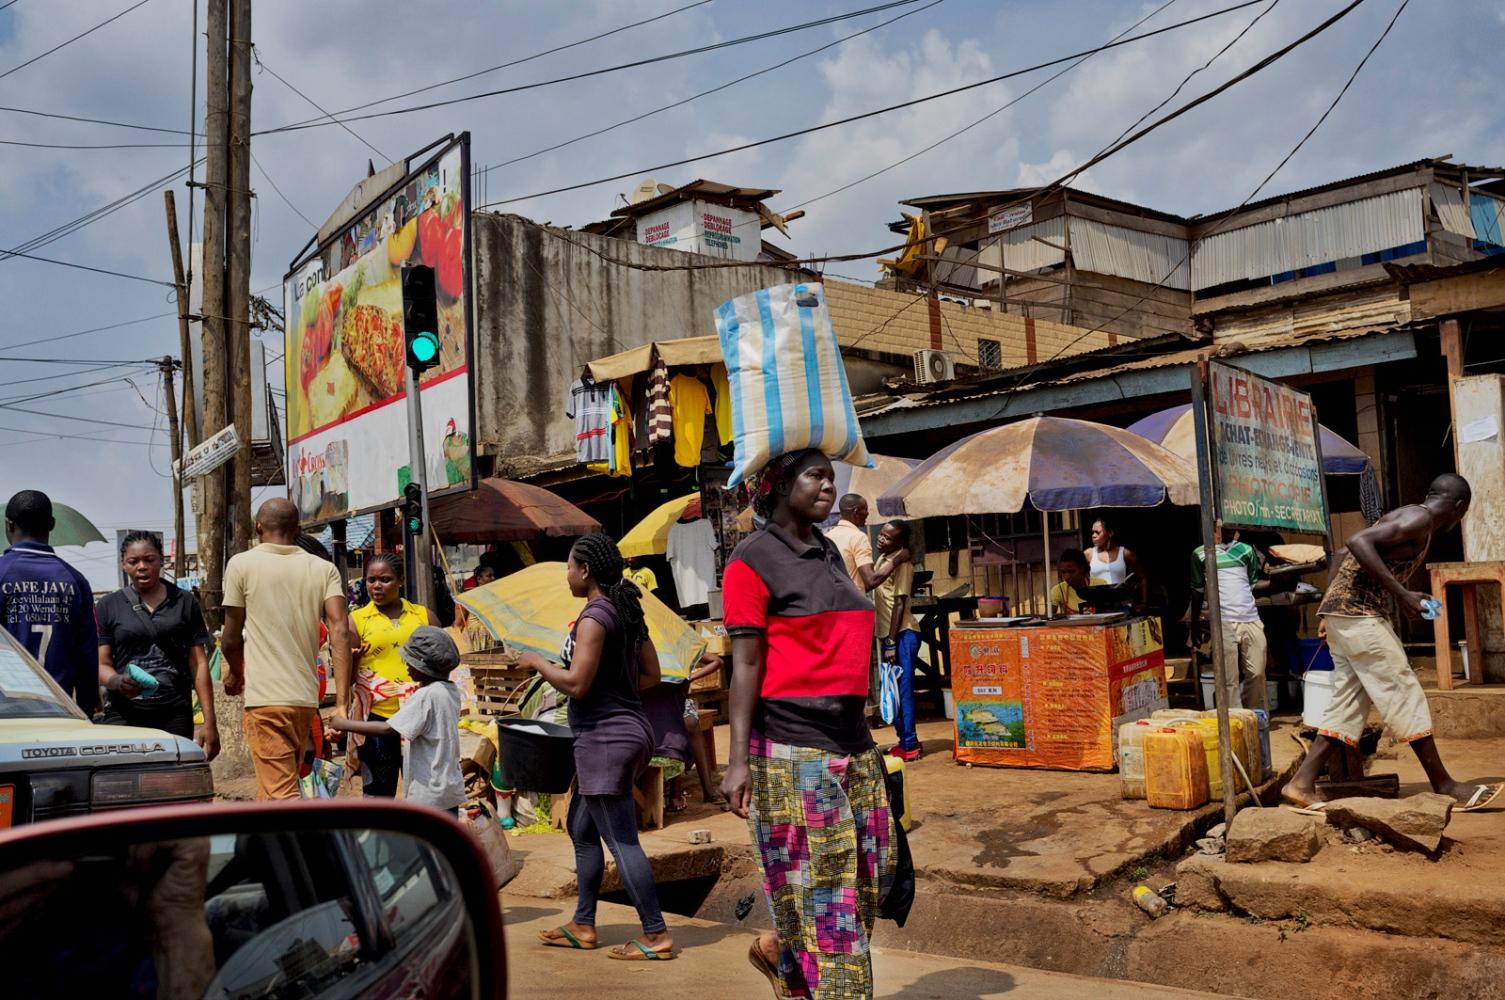 Yaounde street, Cameroon